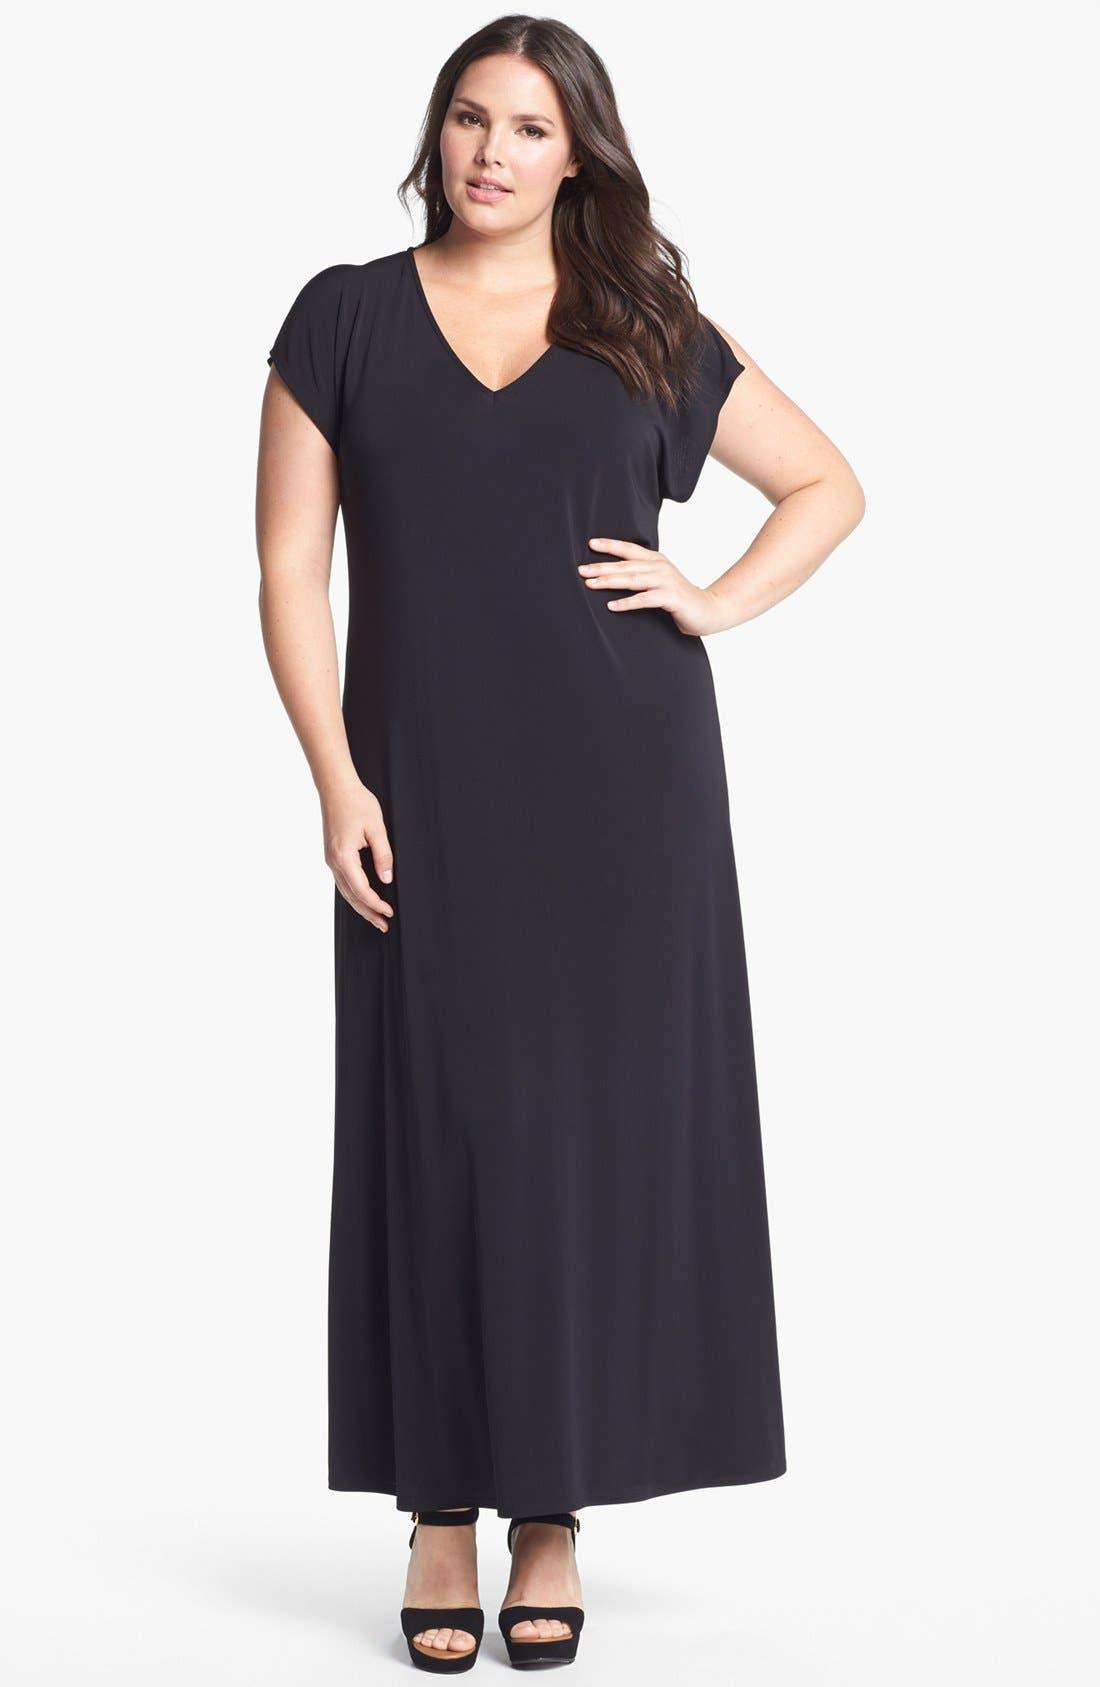 Alternate Image 1 Selected - Evans Cold Shoulder Maxi Dress (Plus Size)